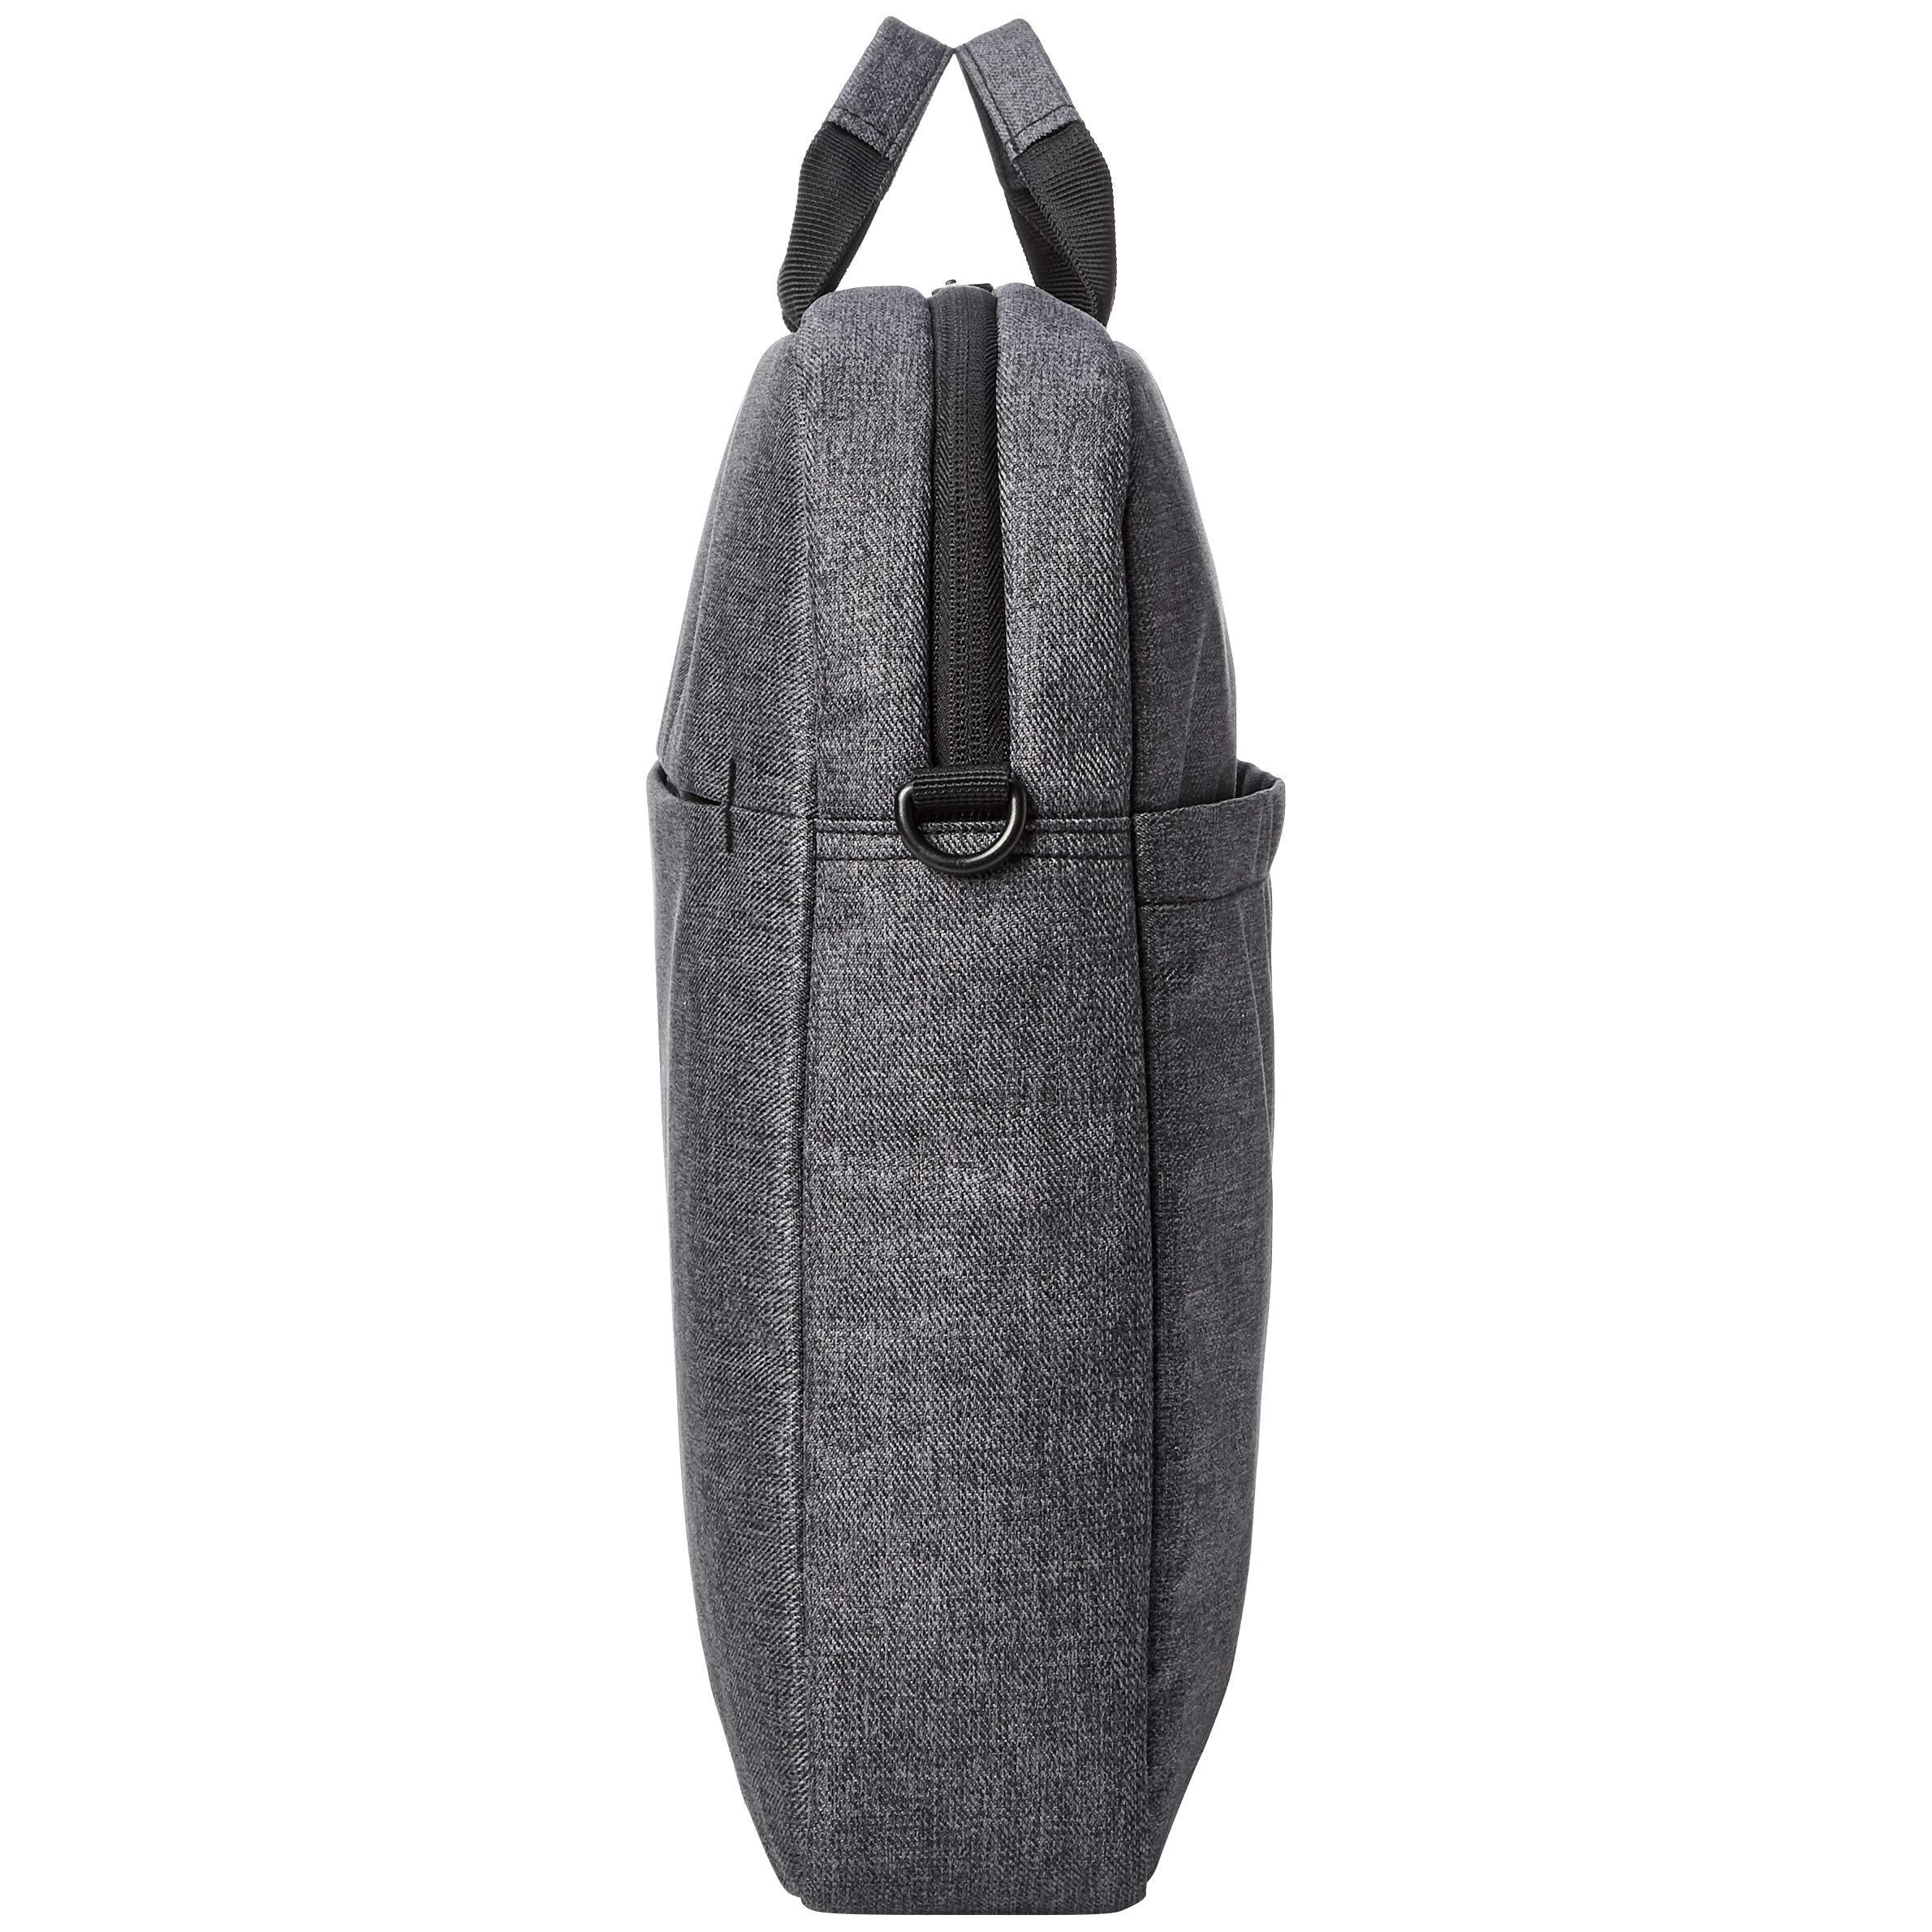 AmazonBasics Urban Laptop and Tablet Case Bag, 17 Inch, Grey by AmazonBasics (Image #4)